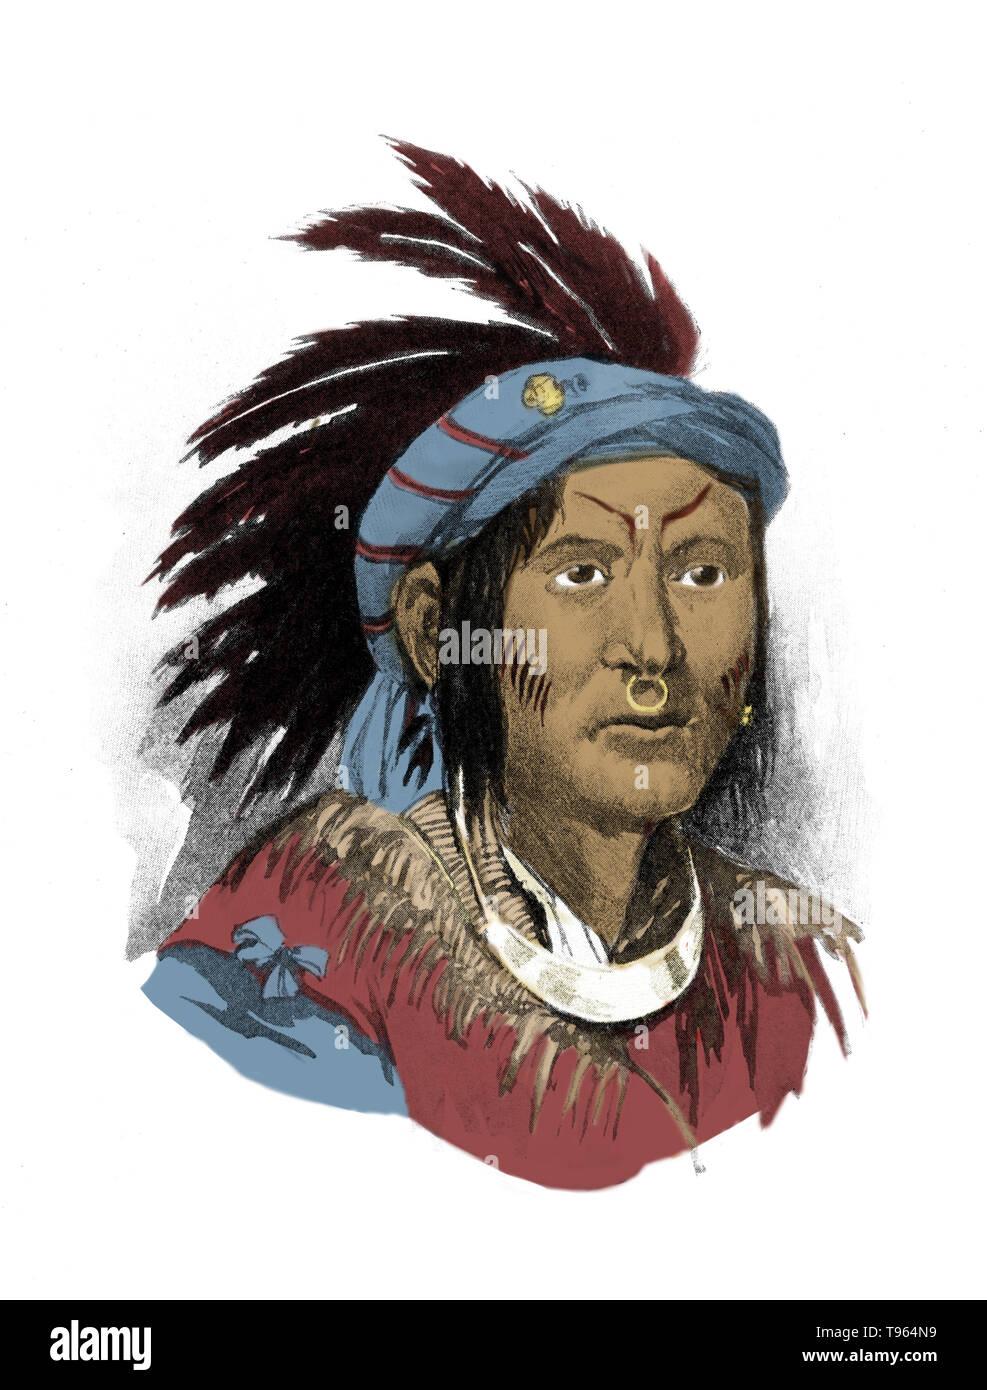 Pontiac (1720 - April 20, 1769) was an Ottawa war chief who became